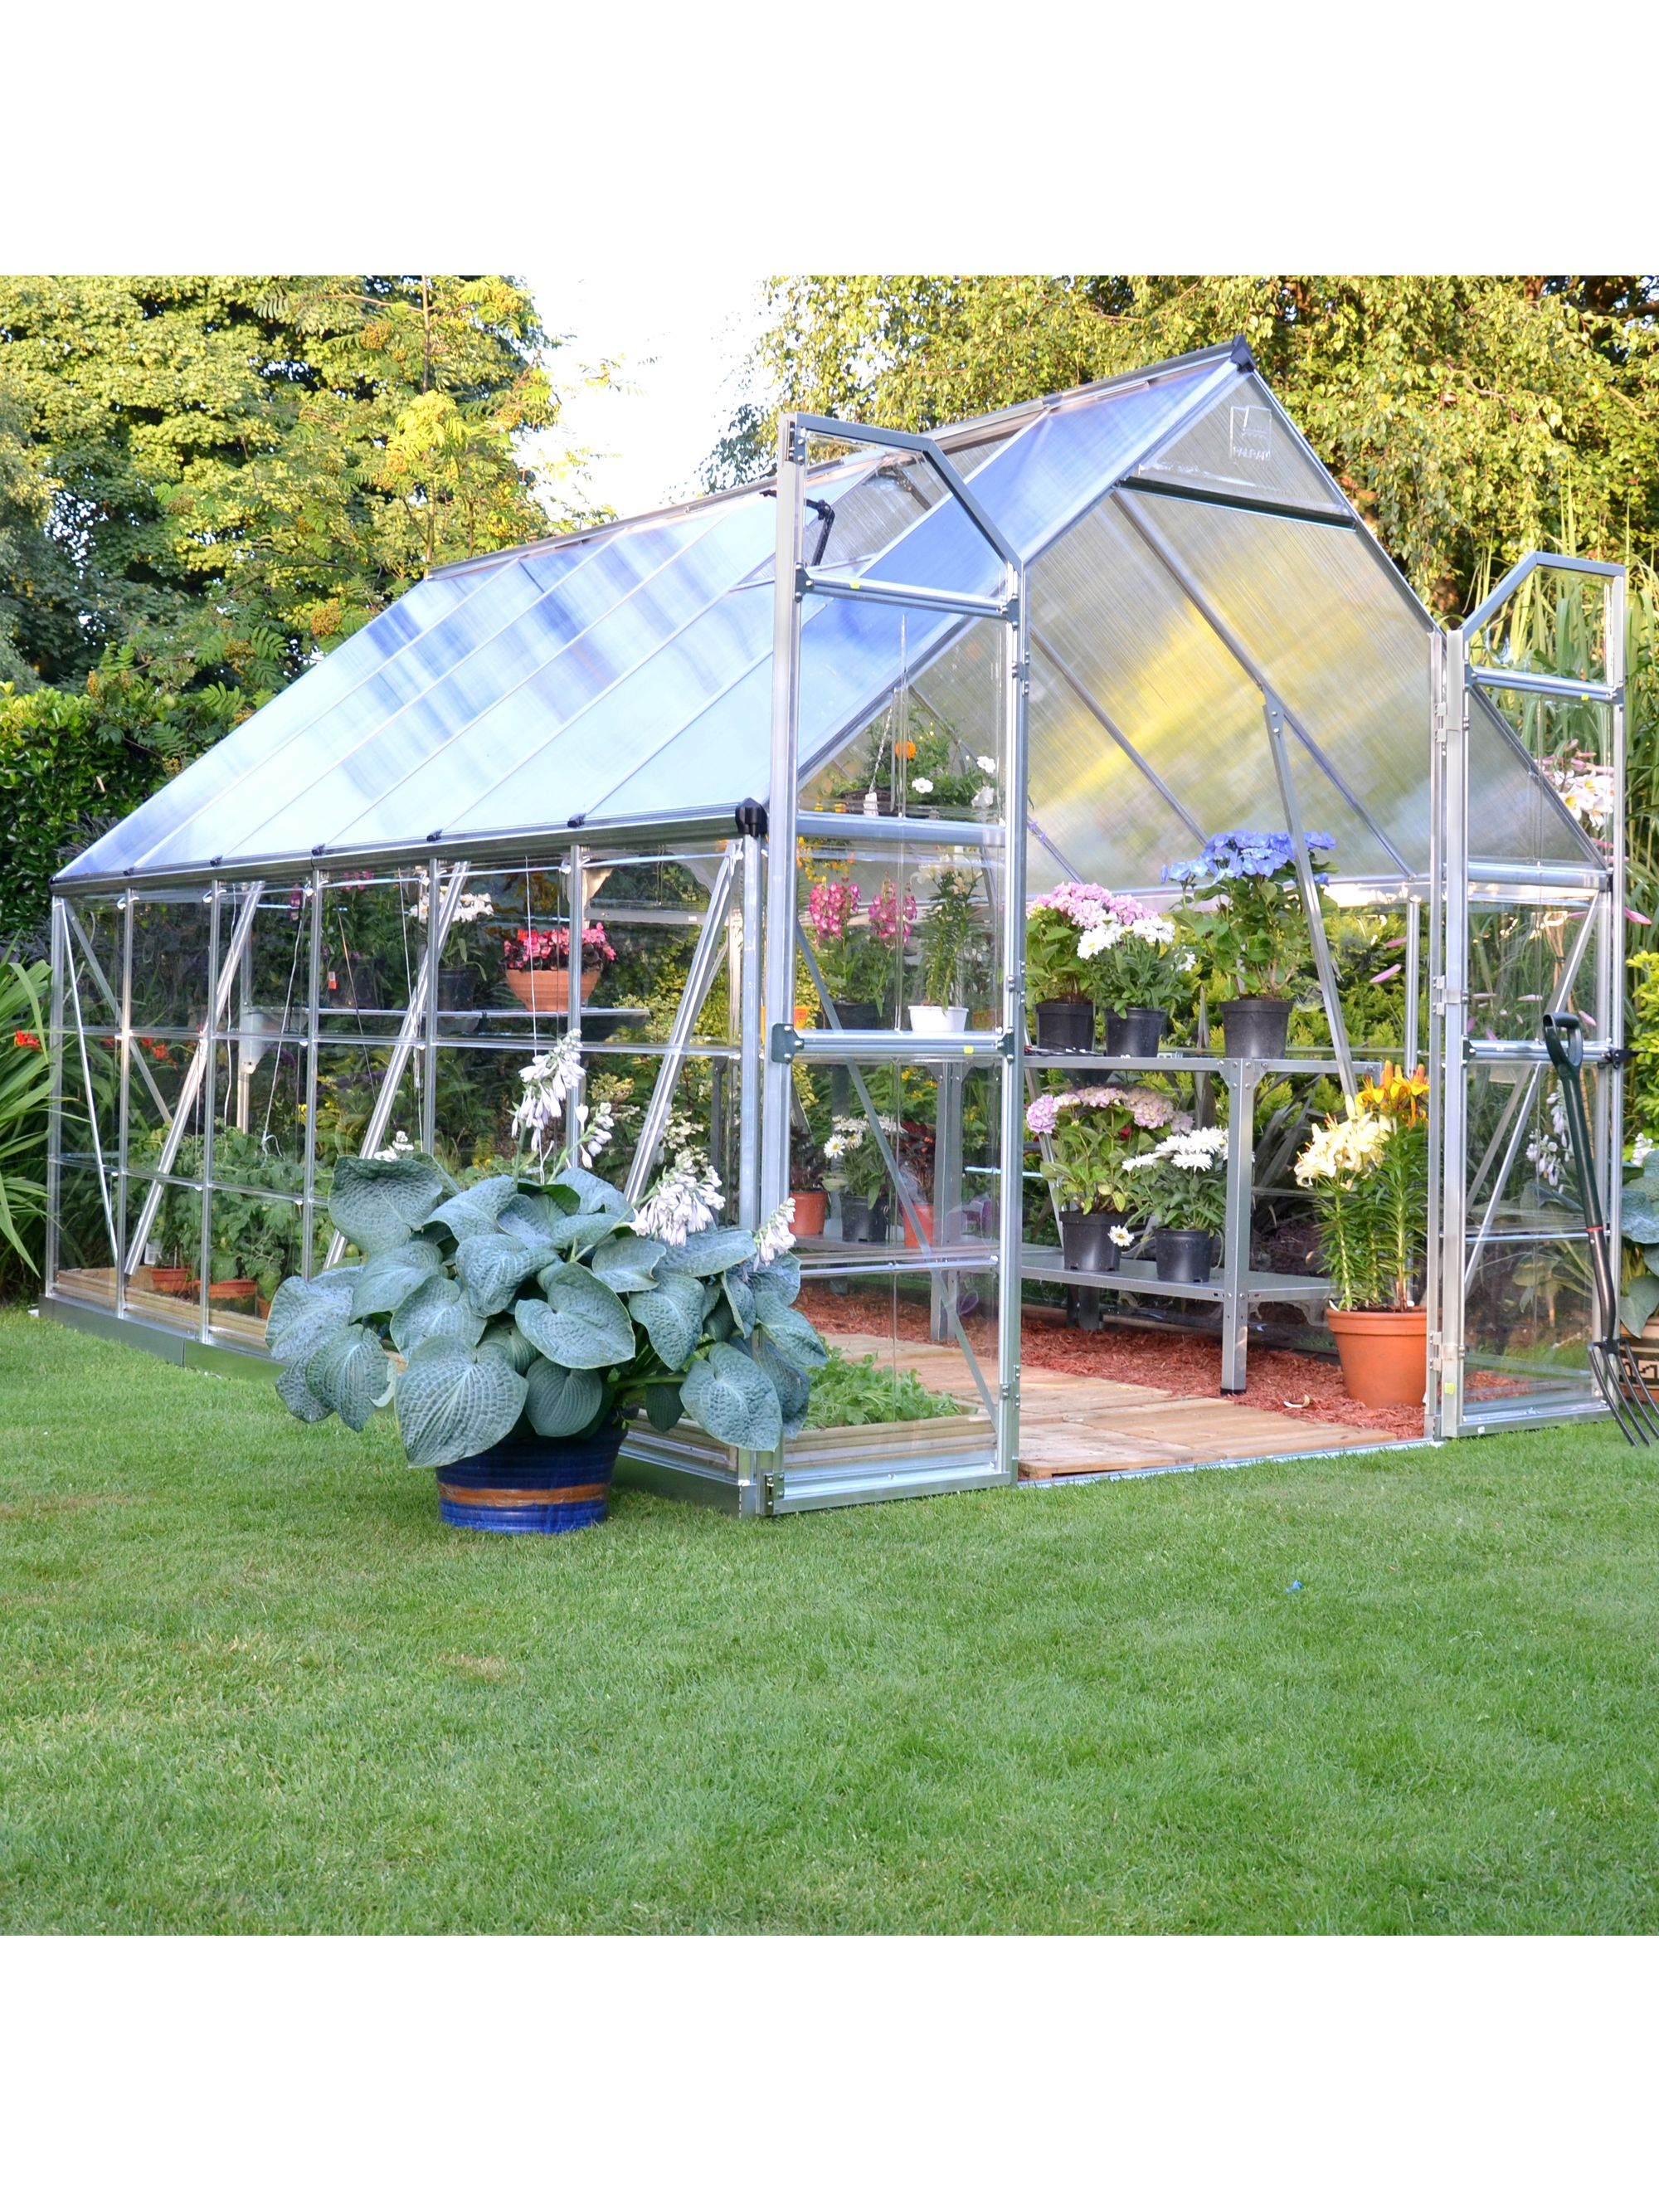 Hobby Grower 8482 8 X 12 Greenhouse Backyard Greenhouse Greenhouse Farming Home Greenhouse Backyard greenhouse kits for sale